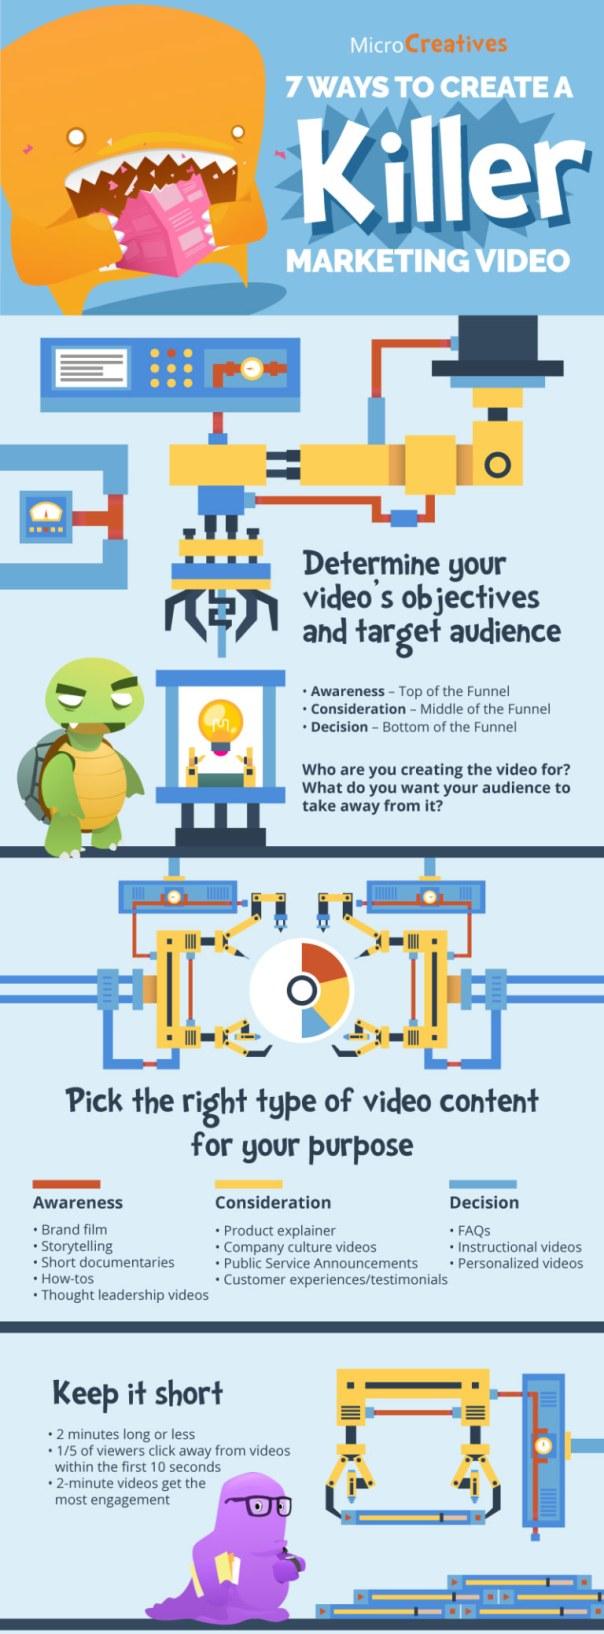 7-Ways-to-Create-Killer-Marketing-Videos-infographic_01